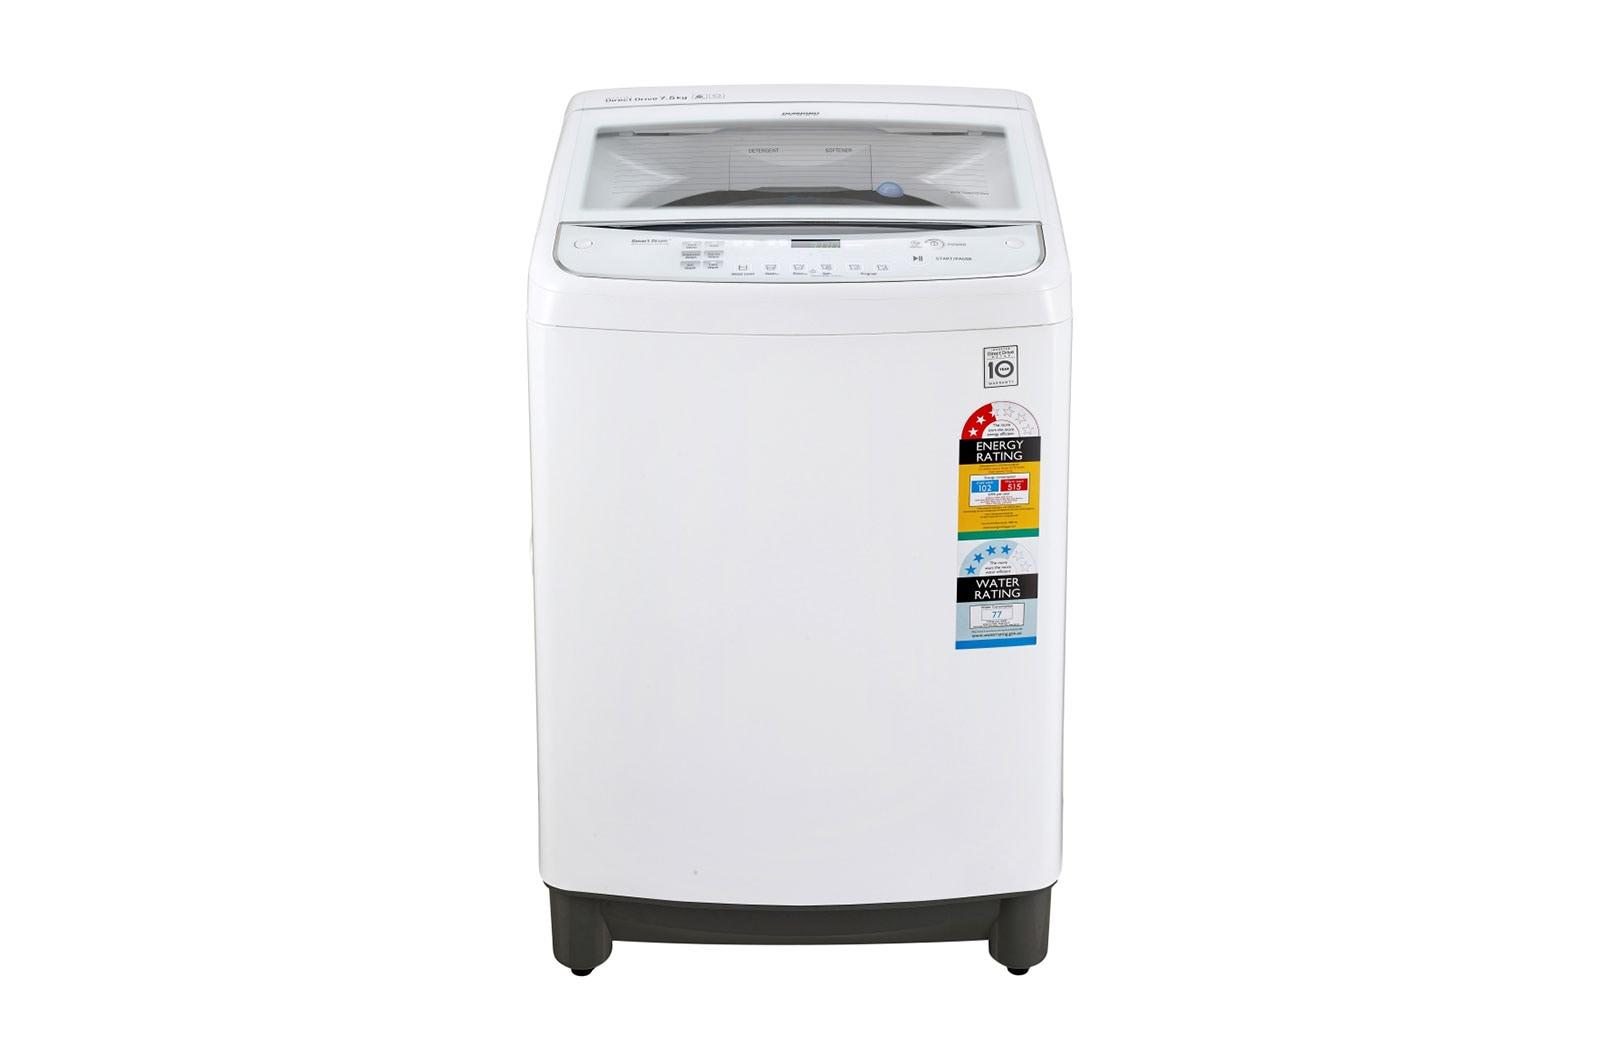 Lg Top Load Washing Machines Wtg7532w Loader Australia